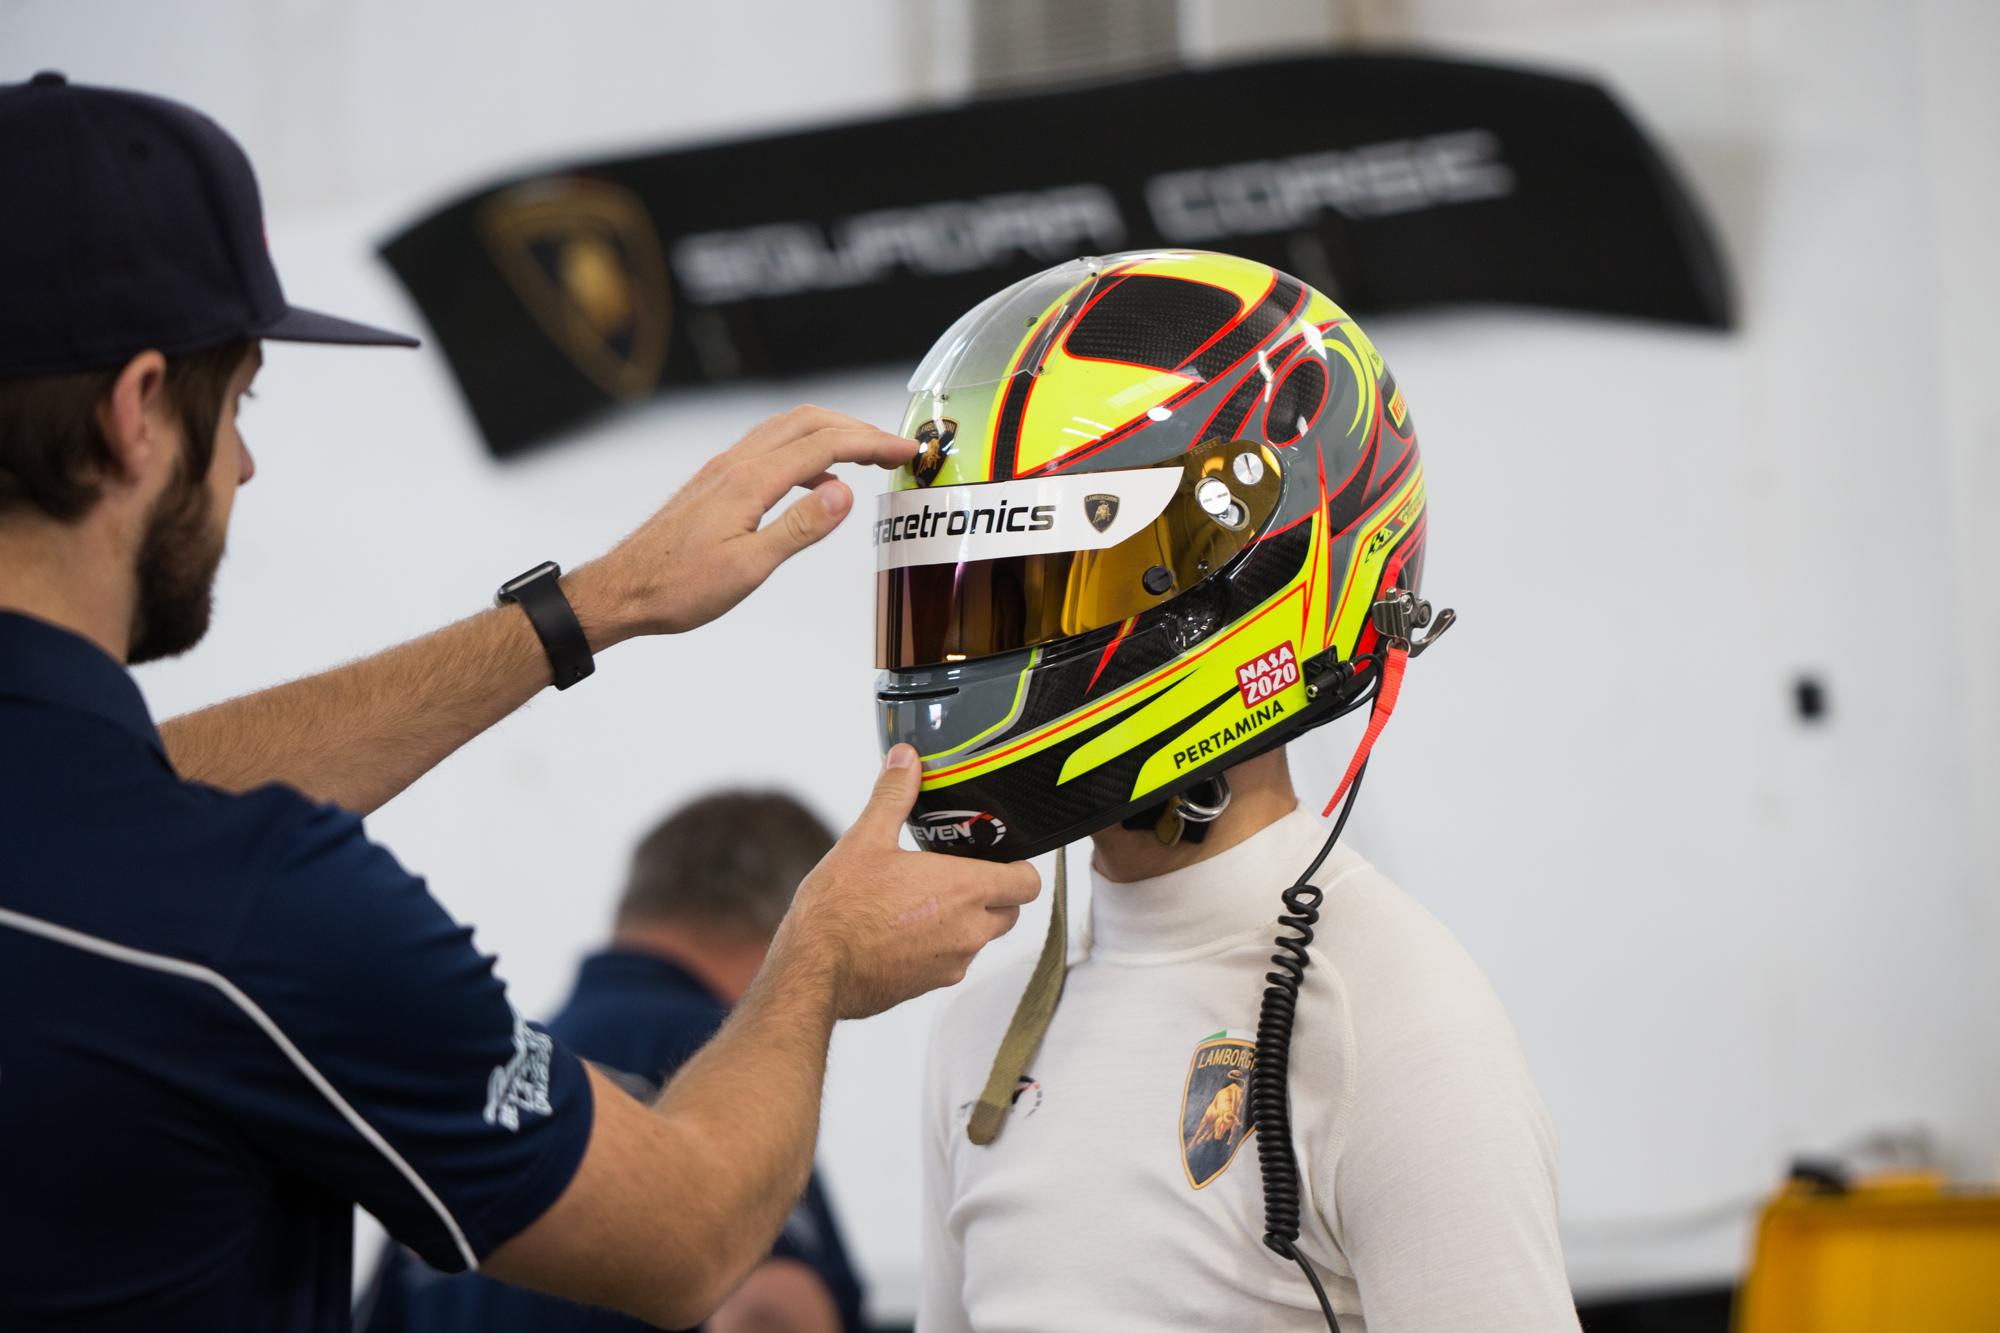 Steven-Racing-20171027-53368.jpg